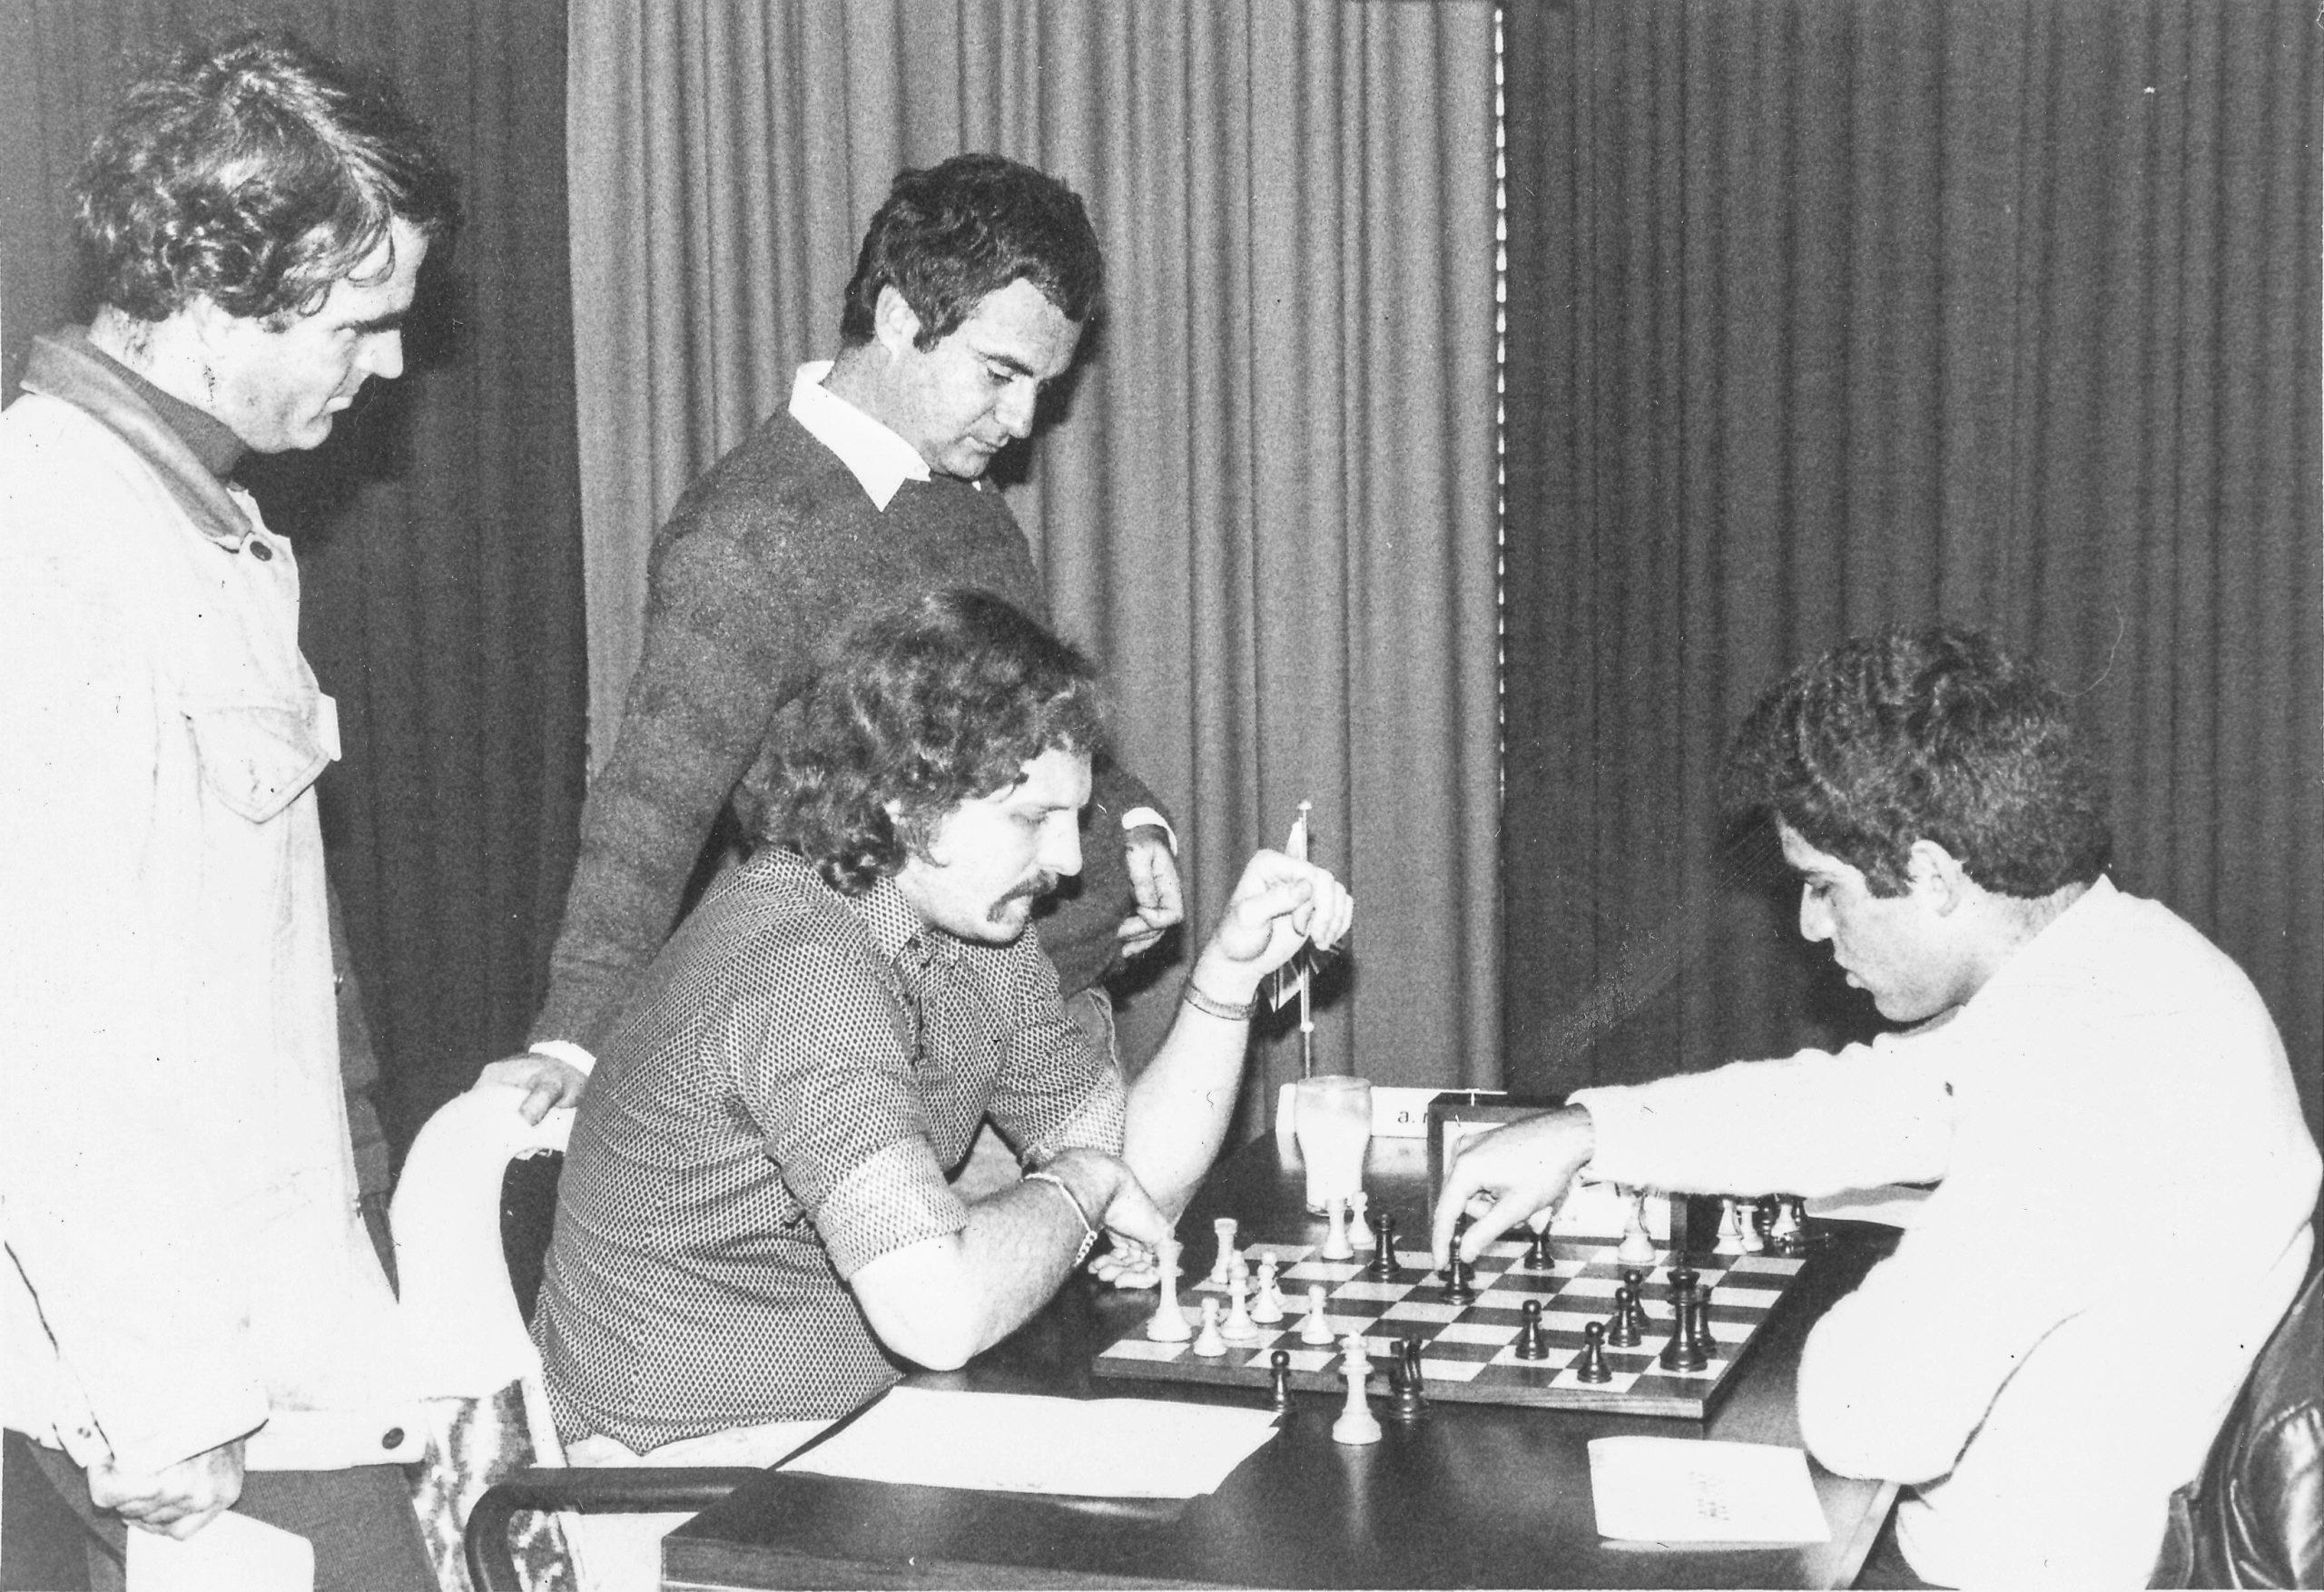 Post mortem analysis with Tony and Garry Kasparov